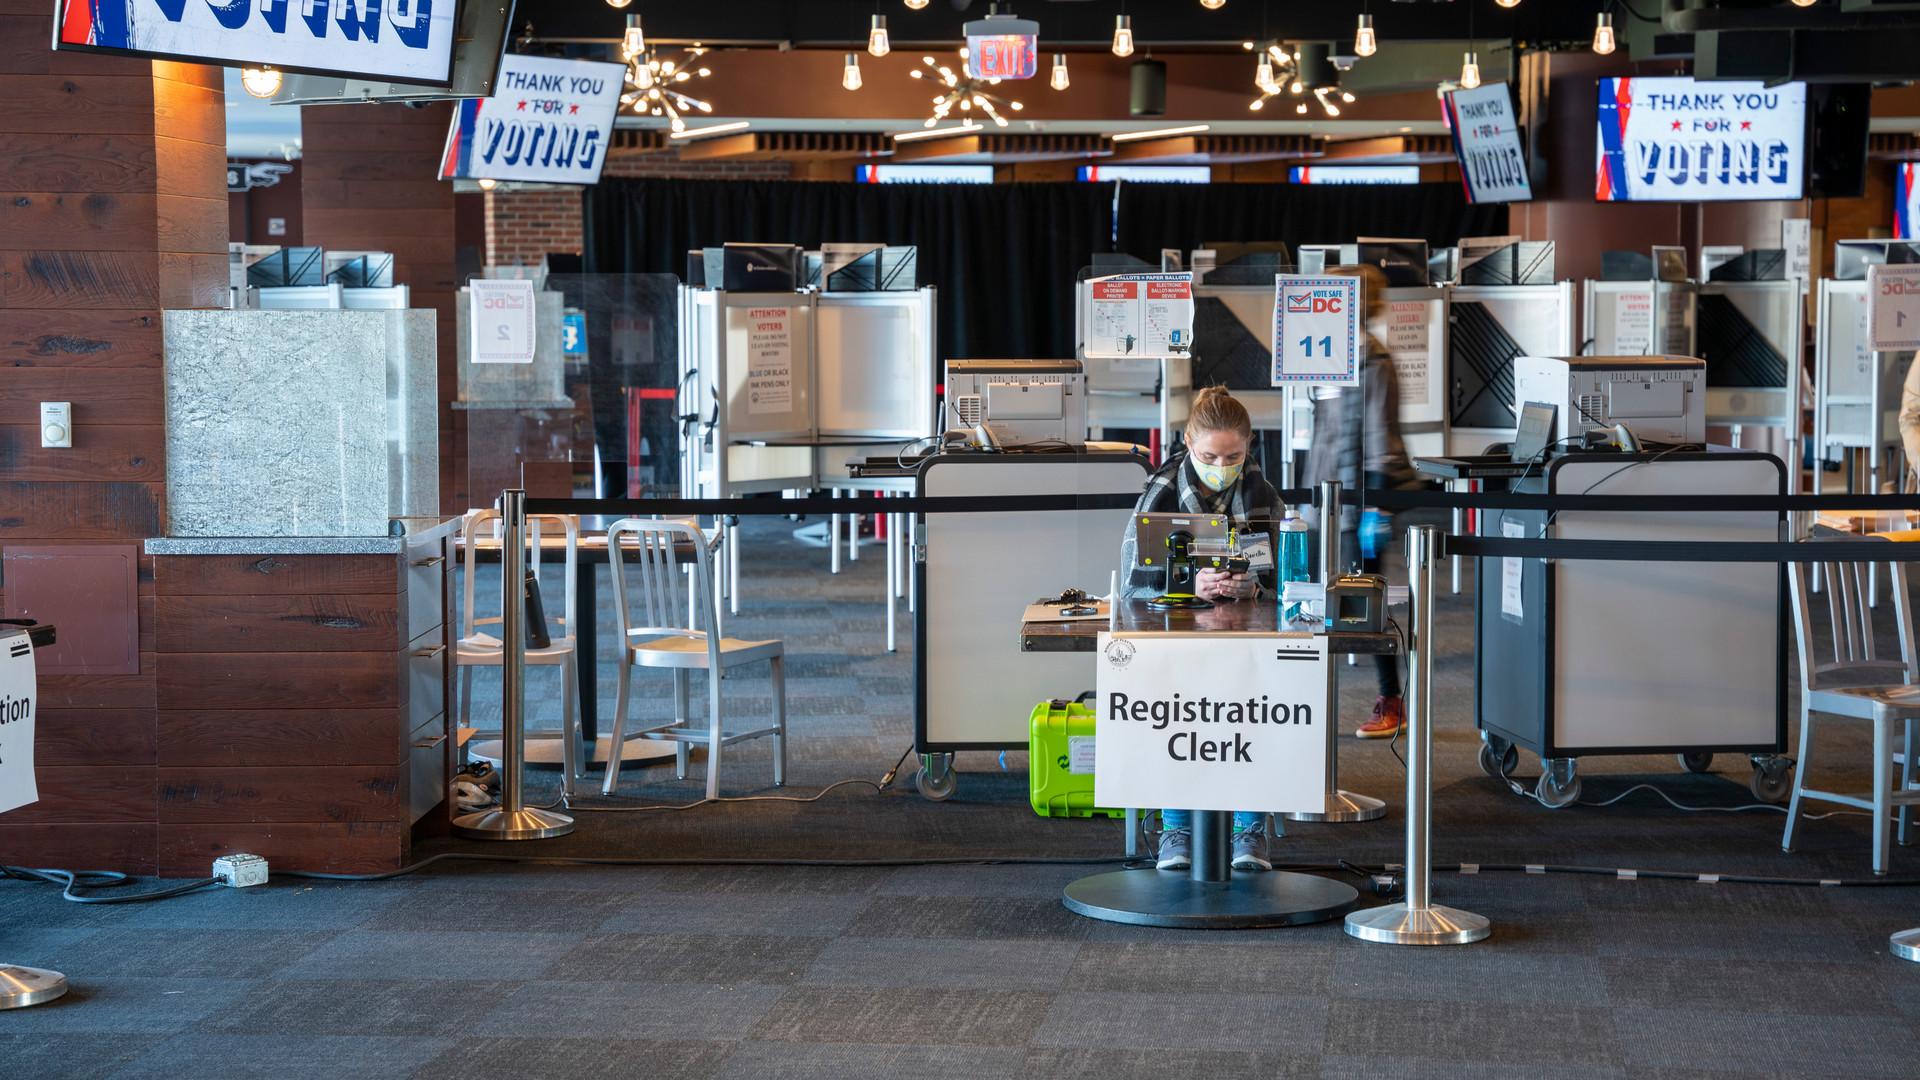 Lone Registration